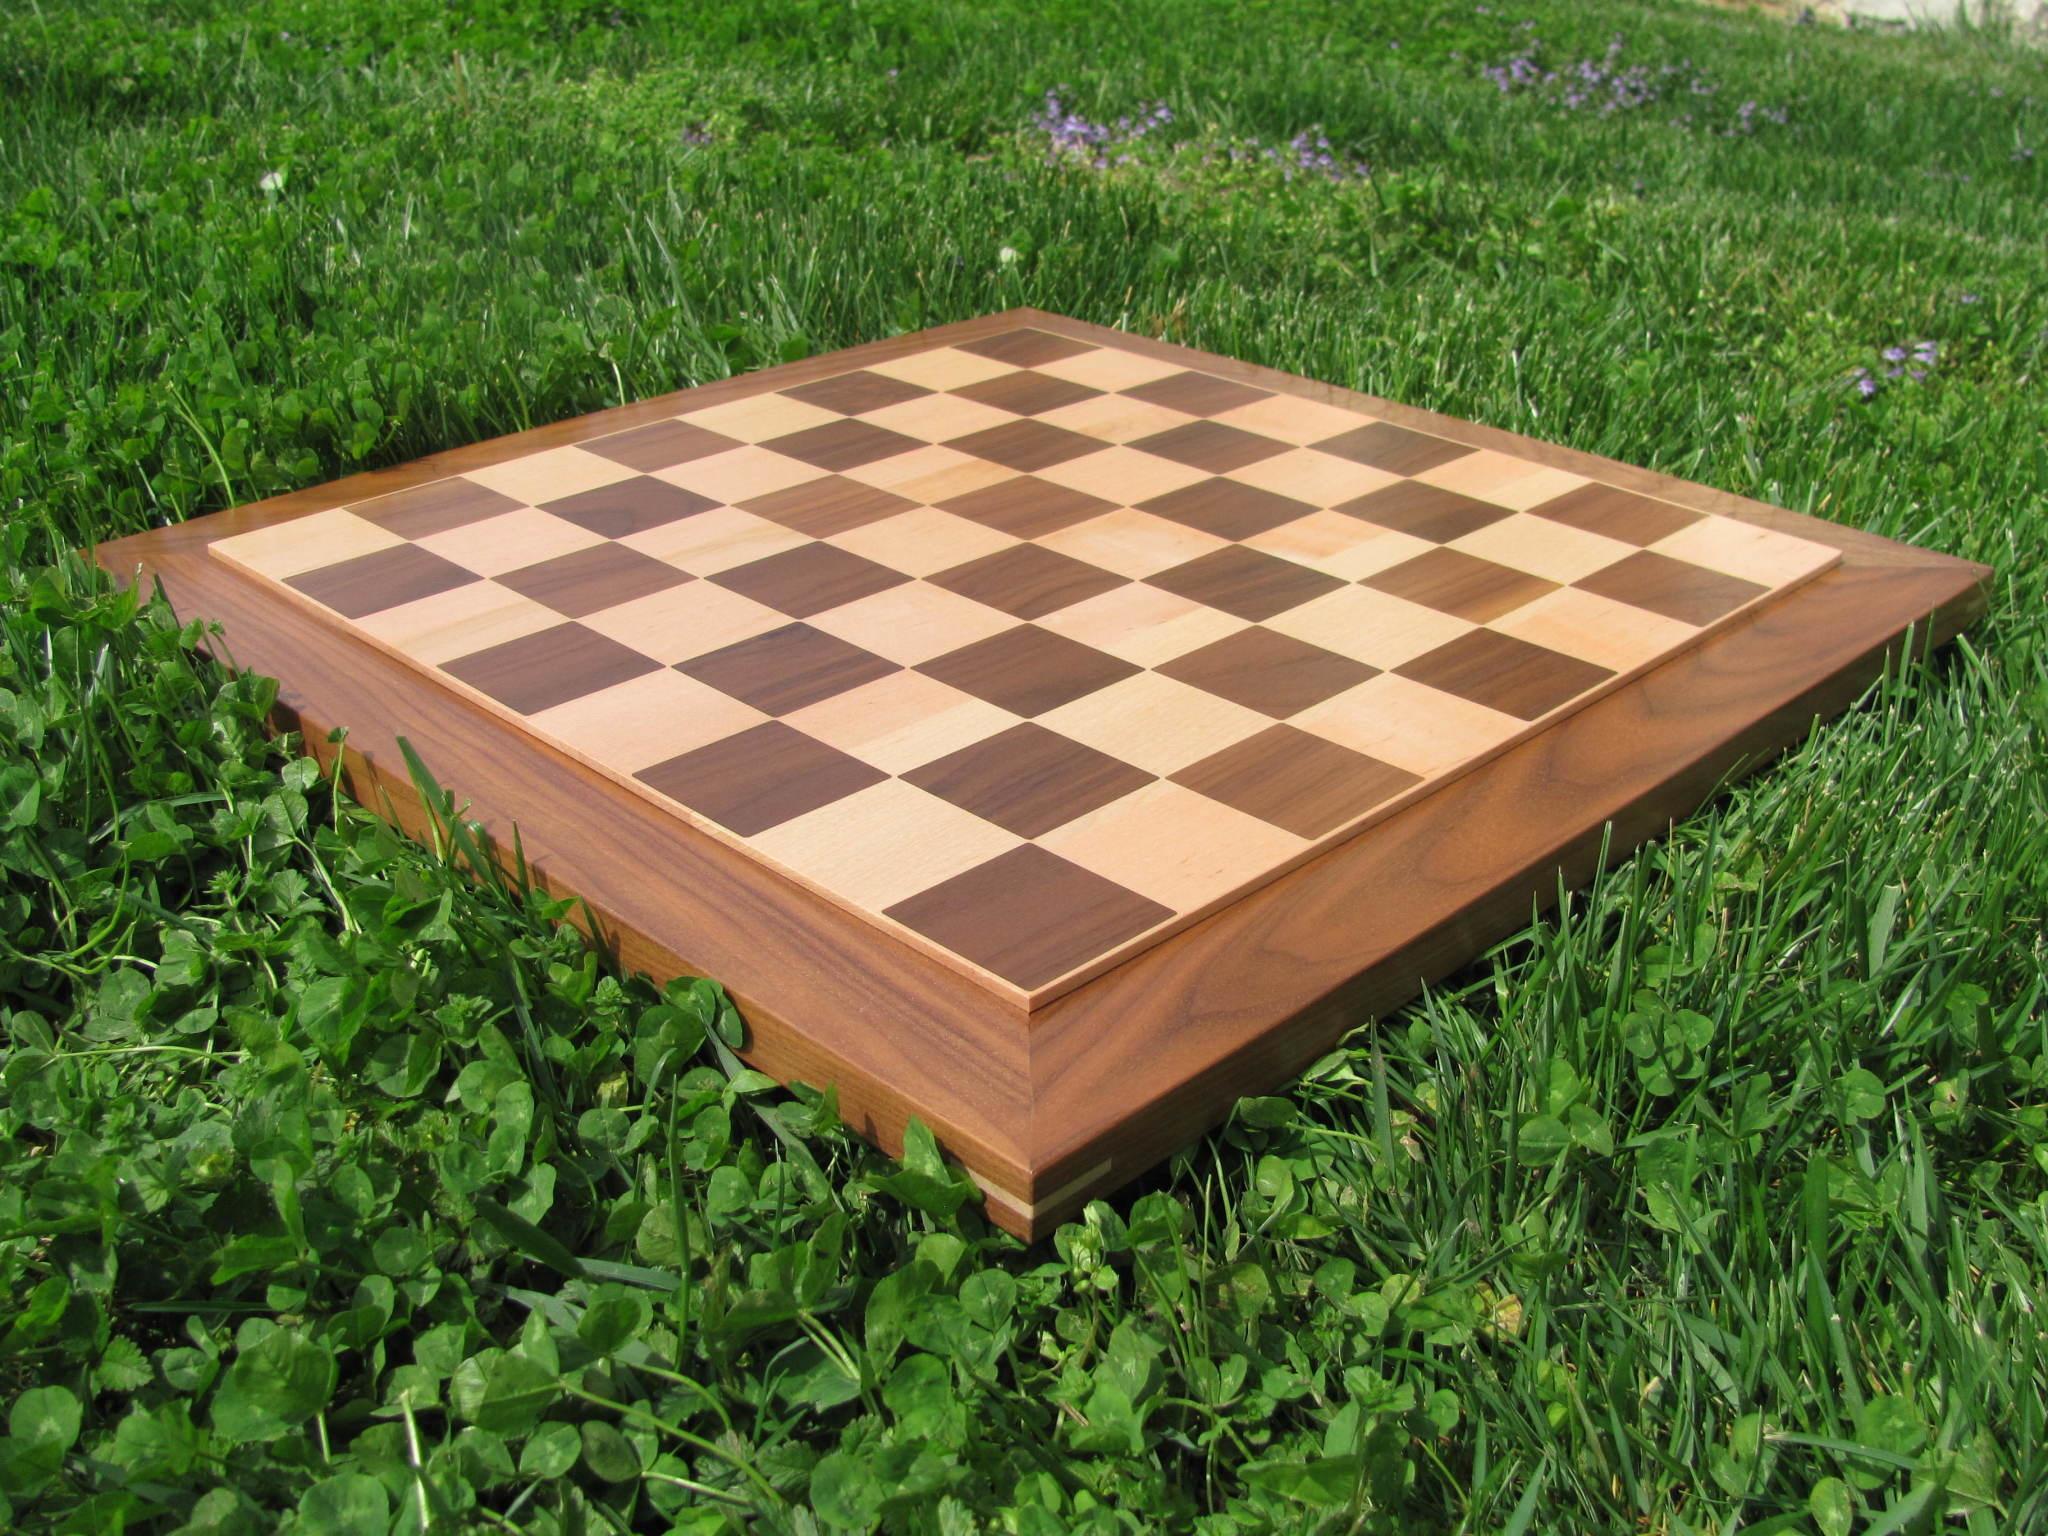 Berea College Crafts Checkerboard